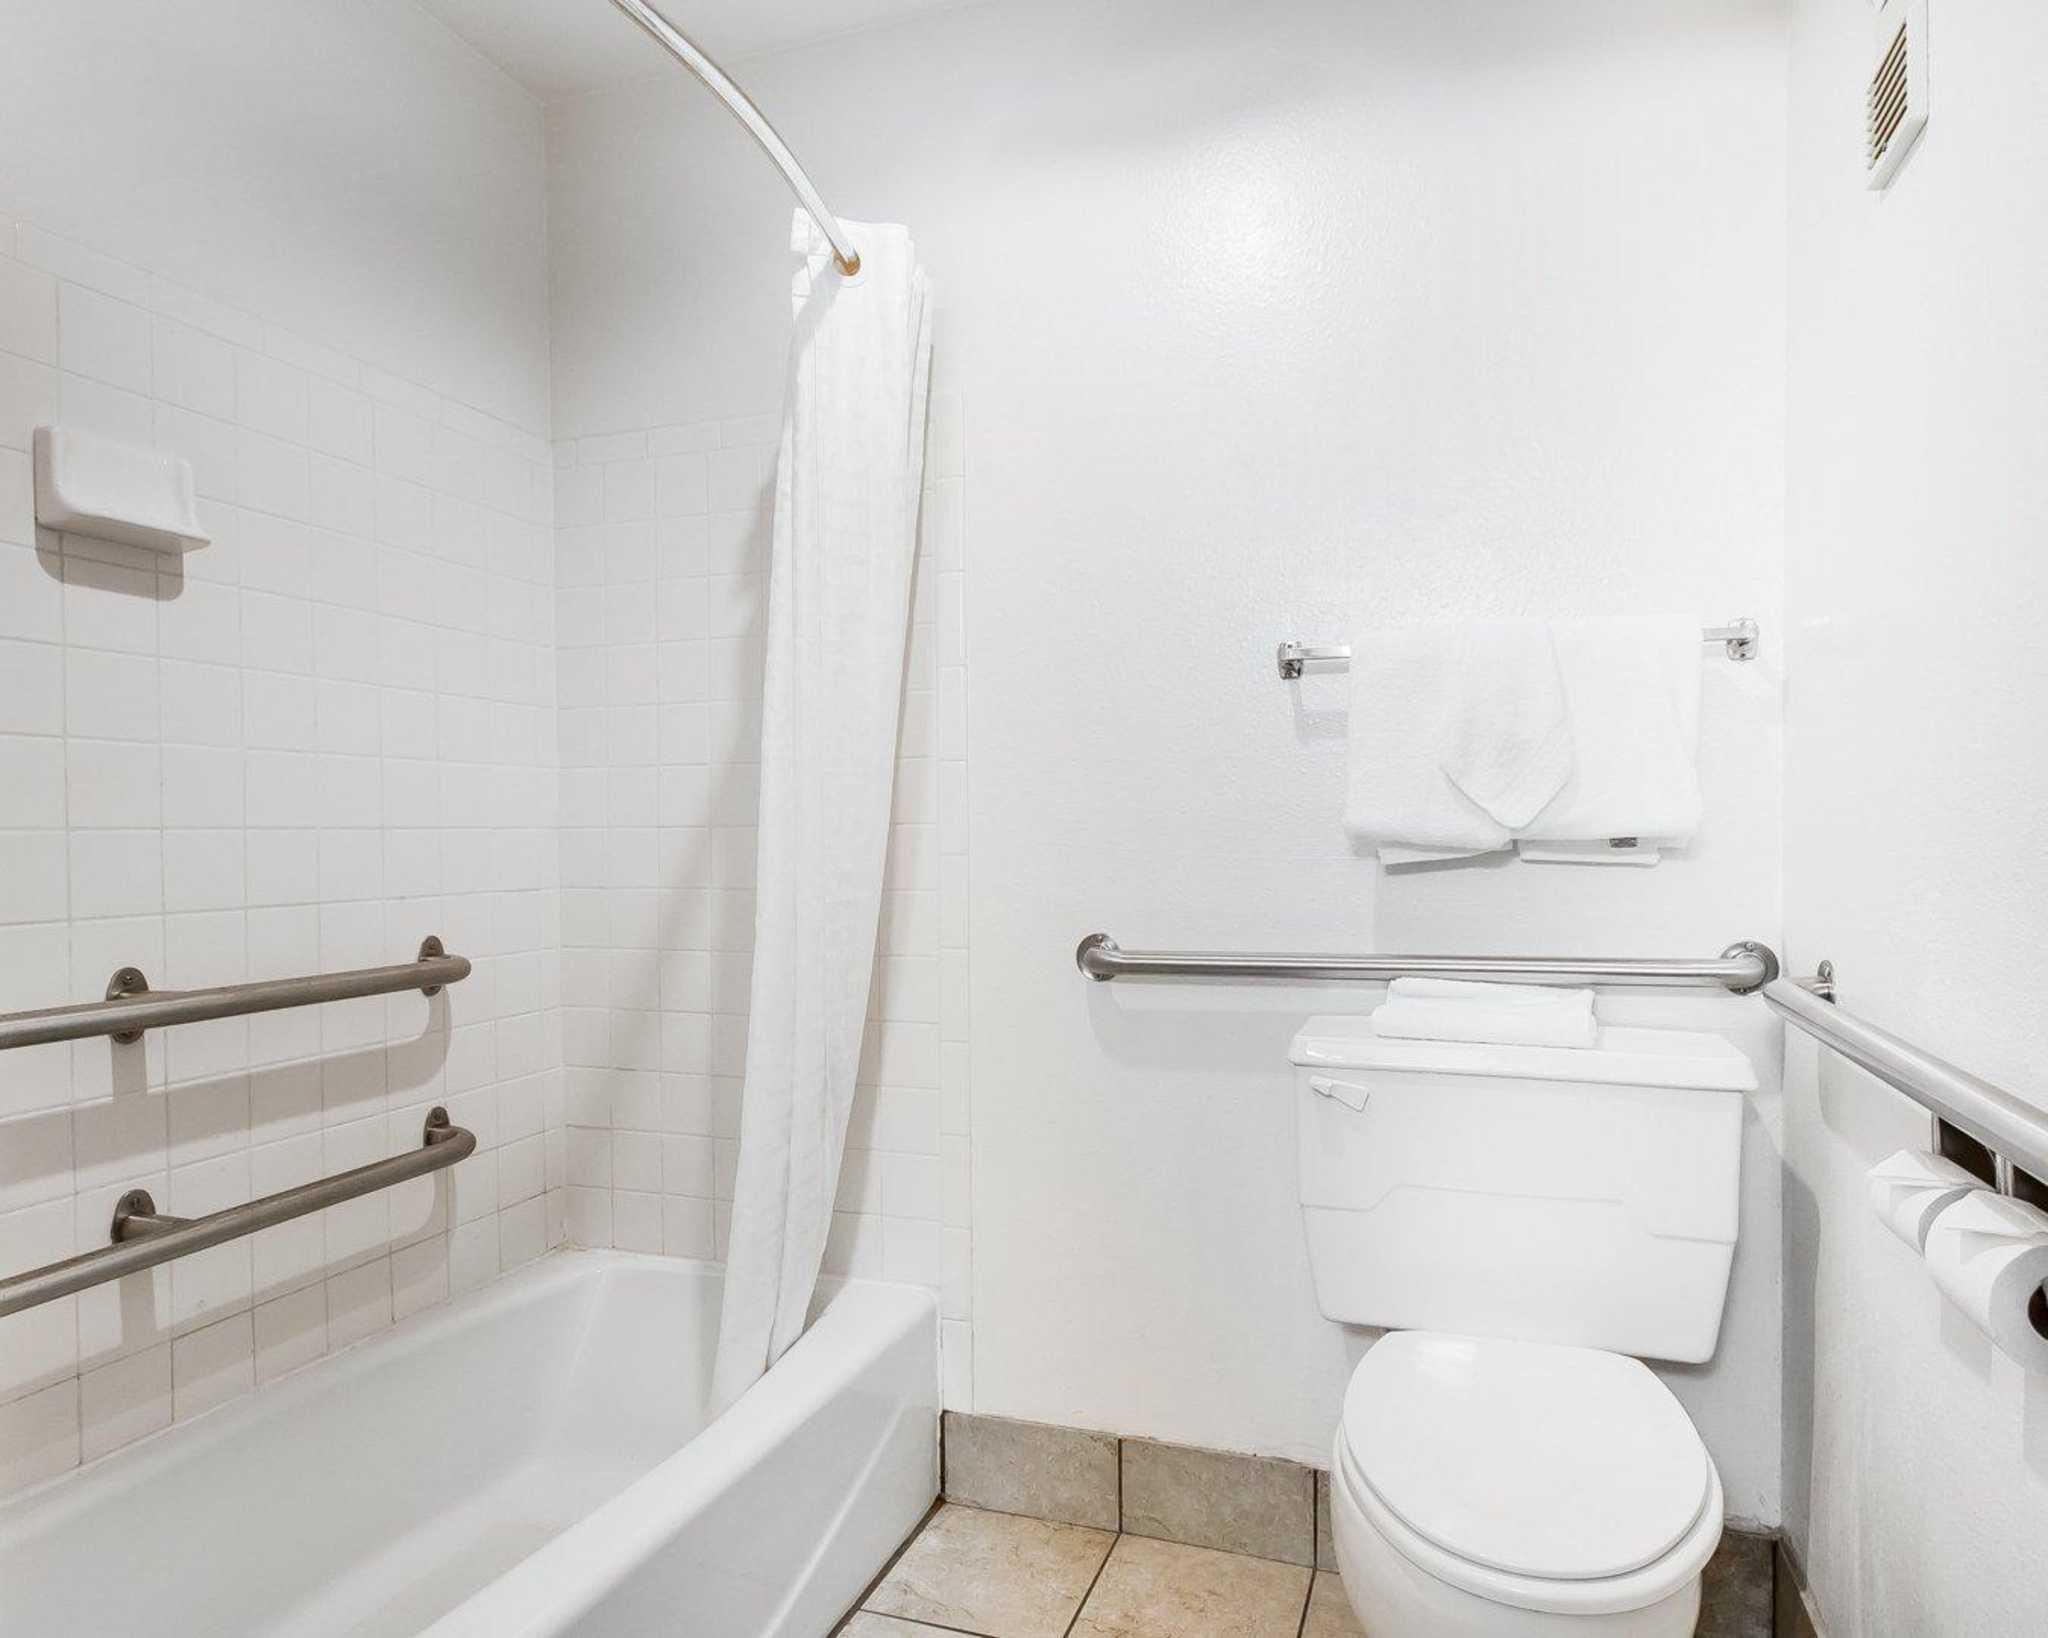 Rodeway Inn & Suites WI Madison-Northeast image 14